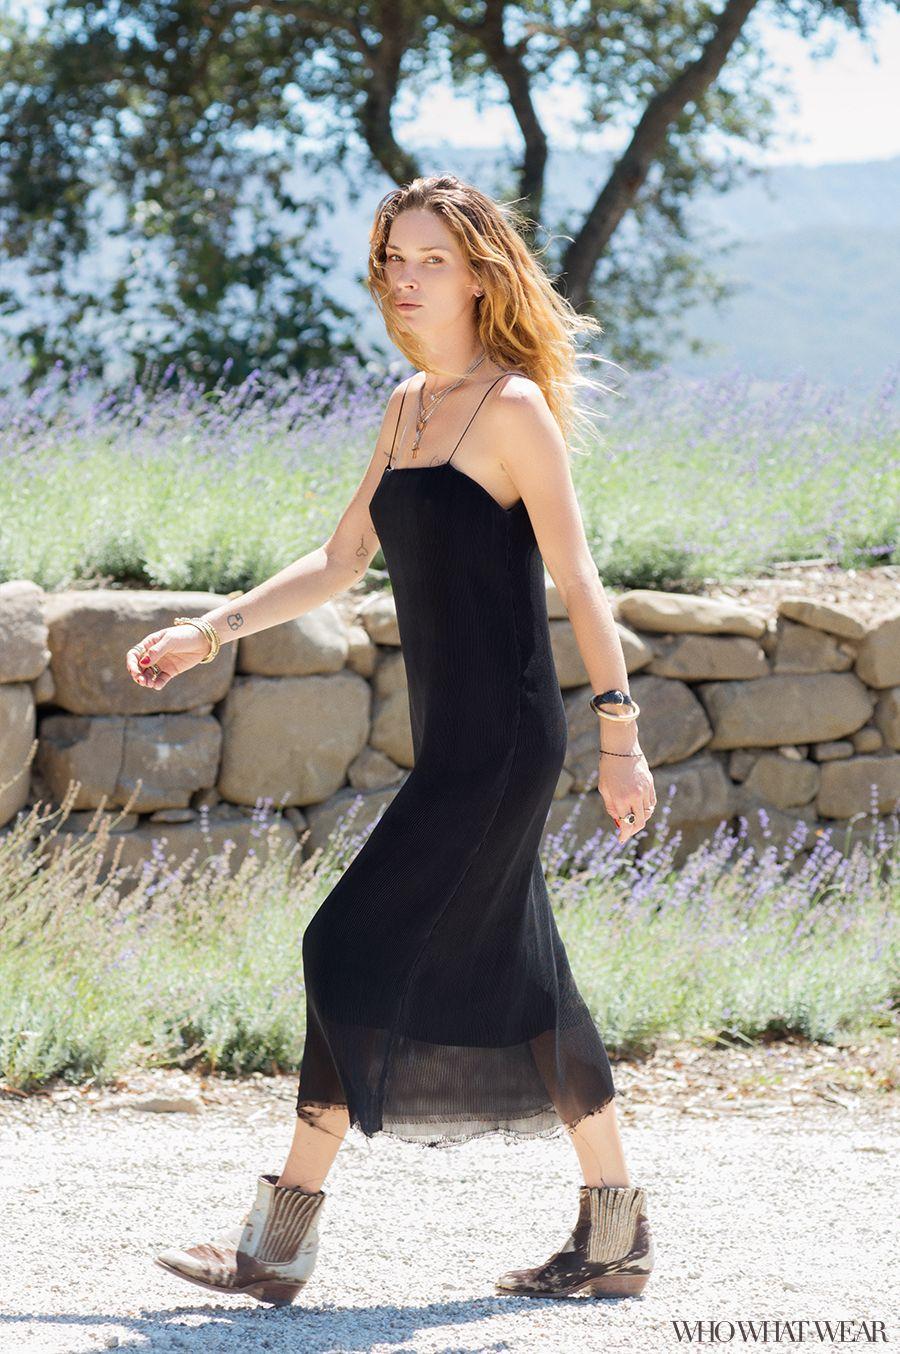 Exclusive: Erin Wasson Takes Us on a Dreamy Escape to Ojai